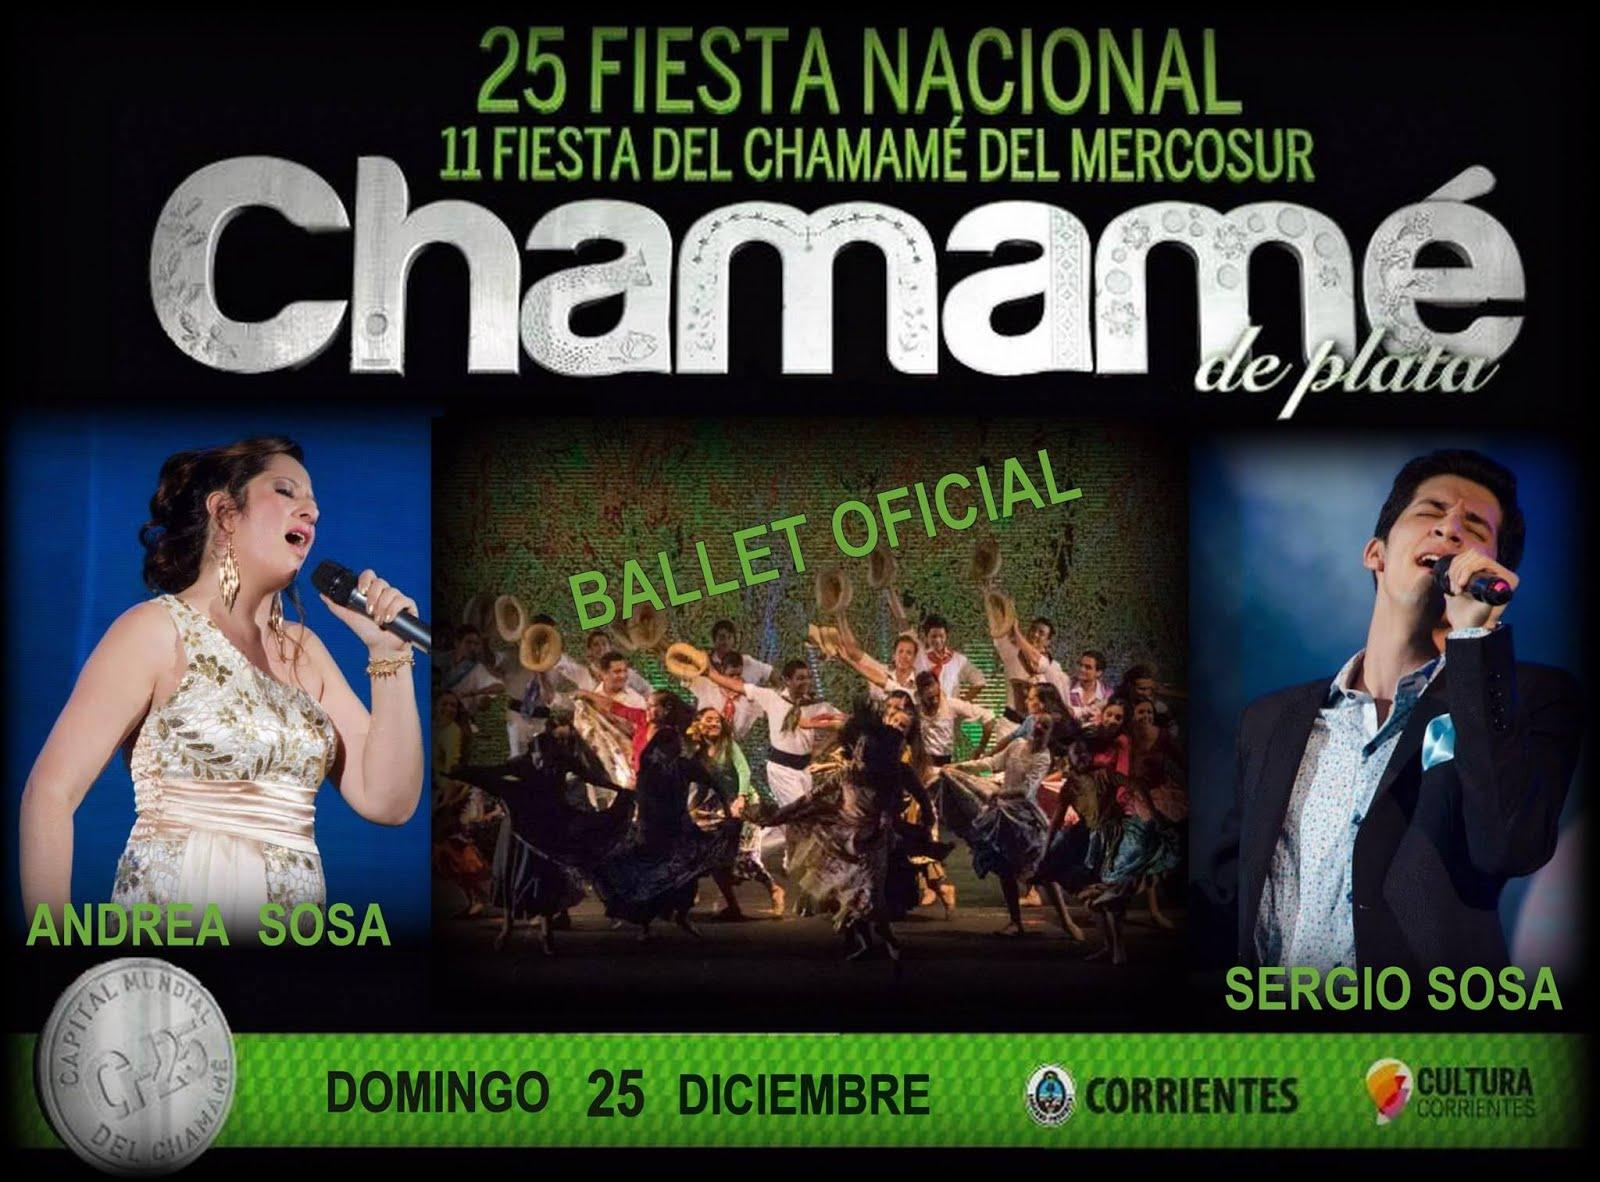 Fiesta Nacional del Chamame